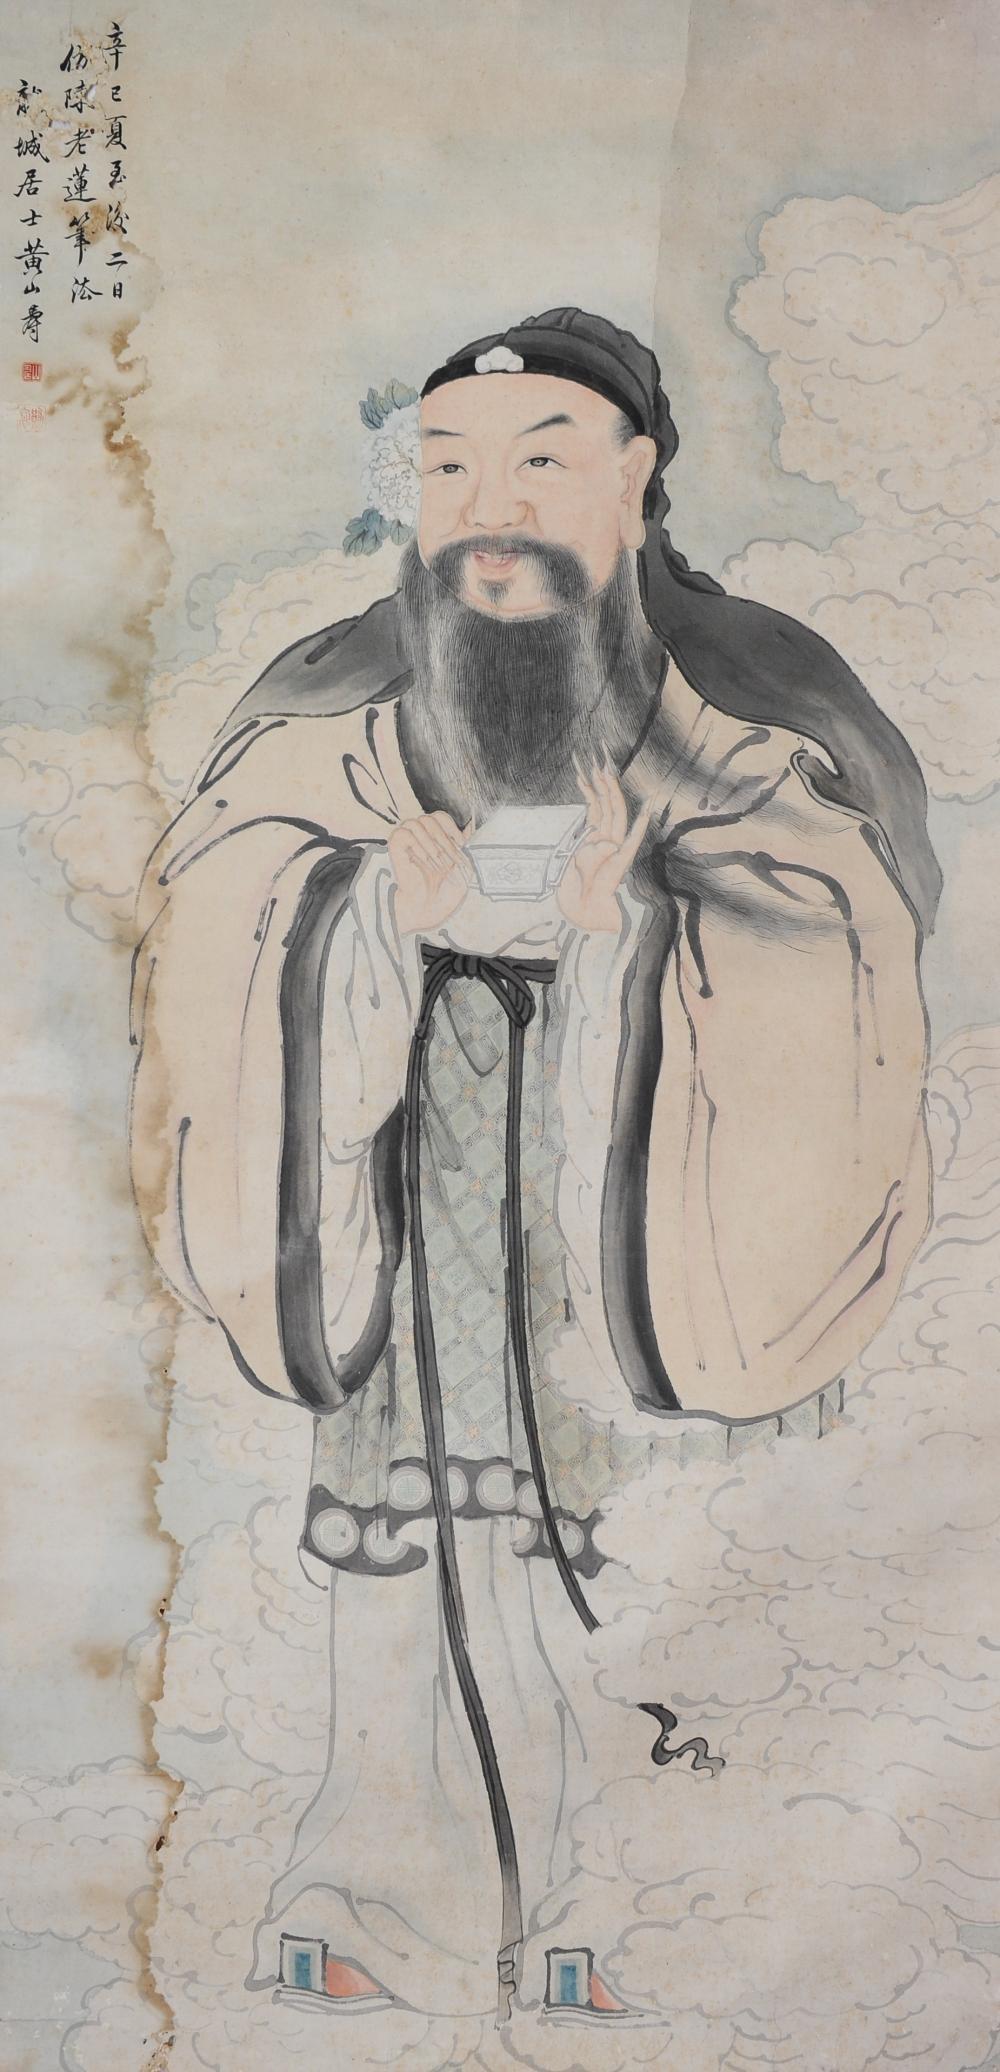 PAINTING OF A GOD AMONG CLOUDS, HUANG SHANSHOU